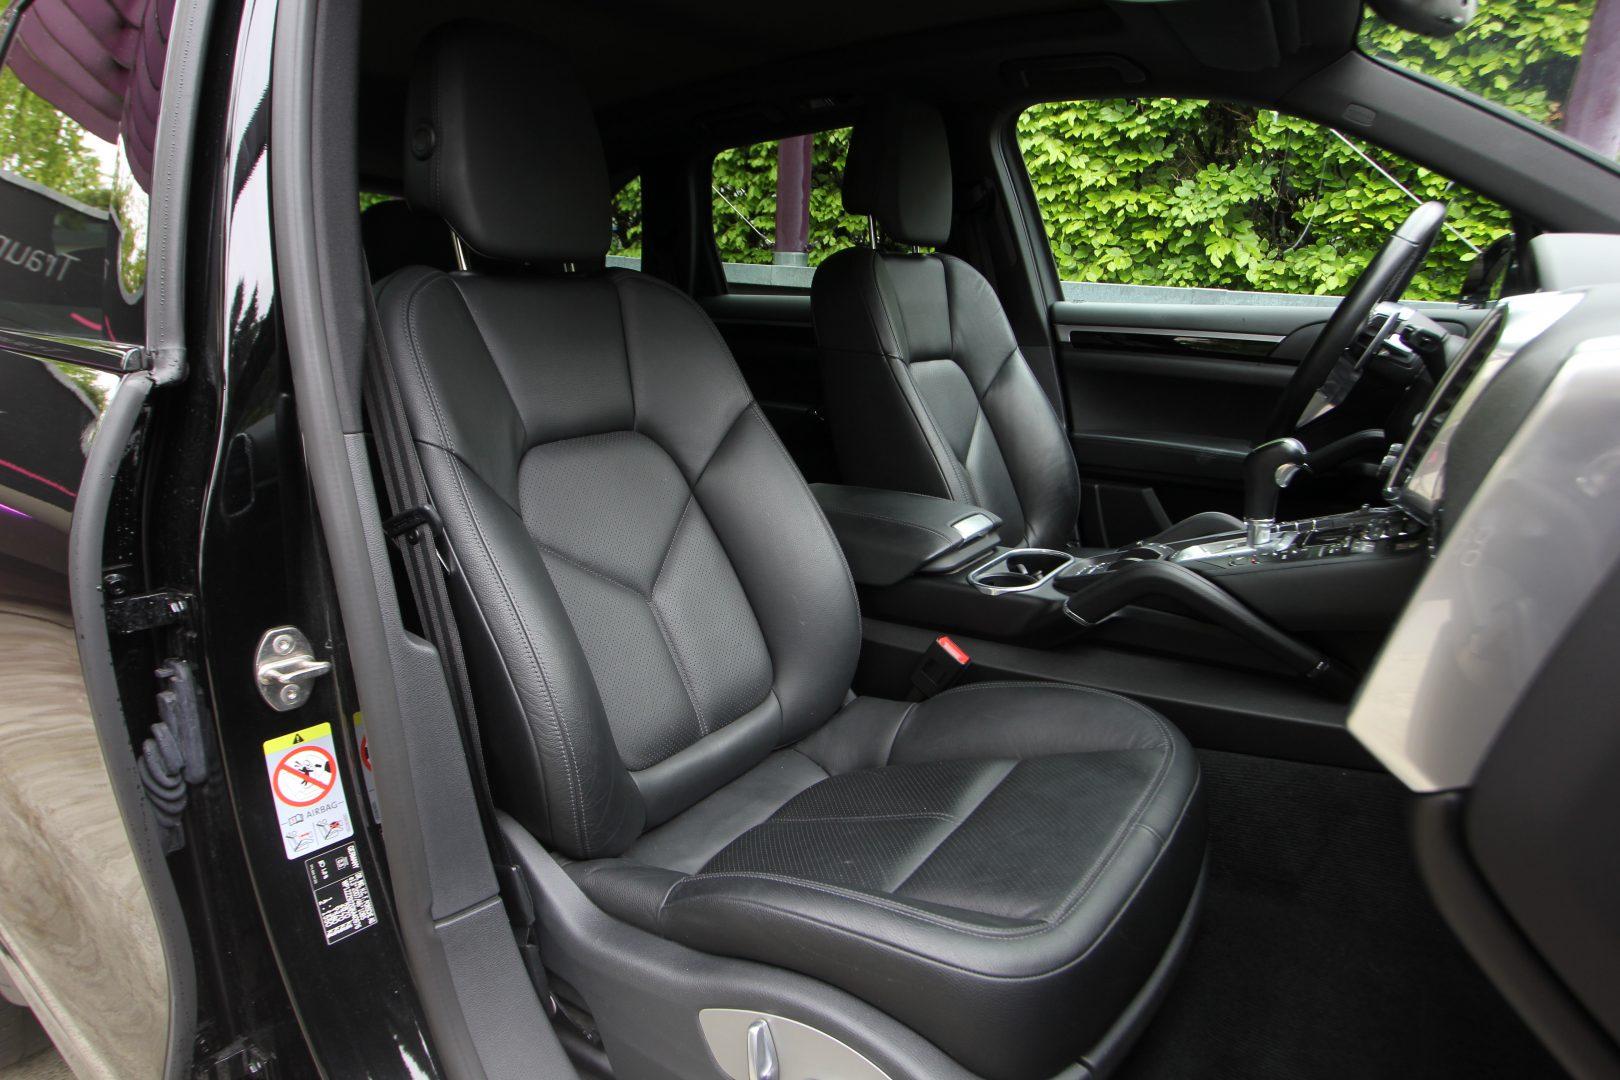 AIL Porsche Cayenne Panorama 21 Zoll  9